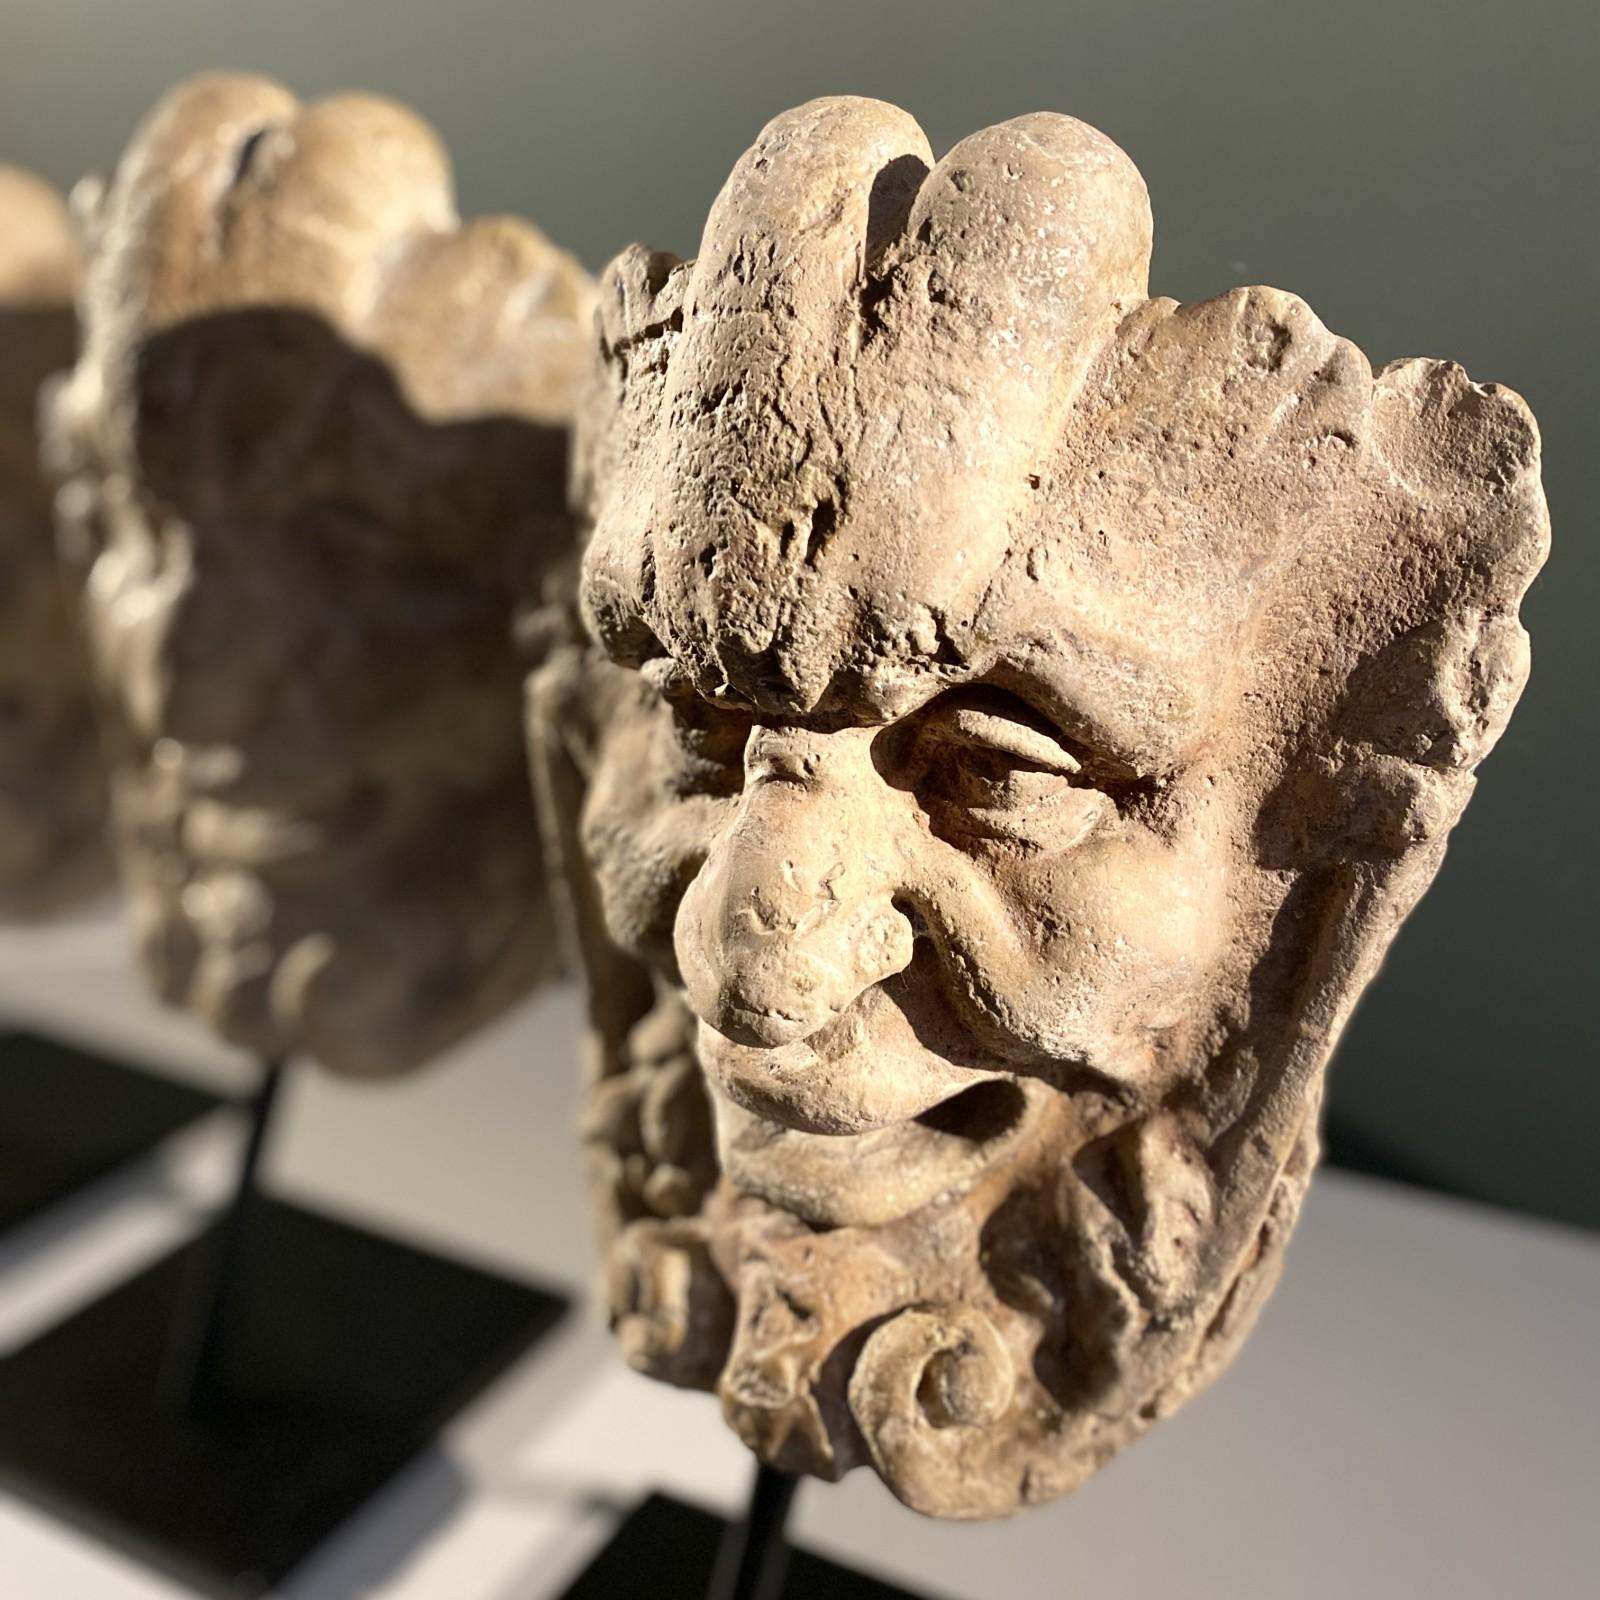 satyrs